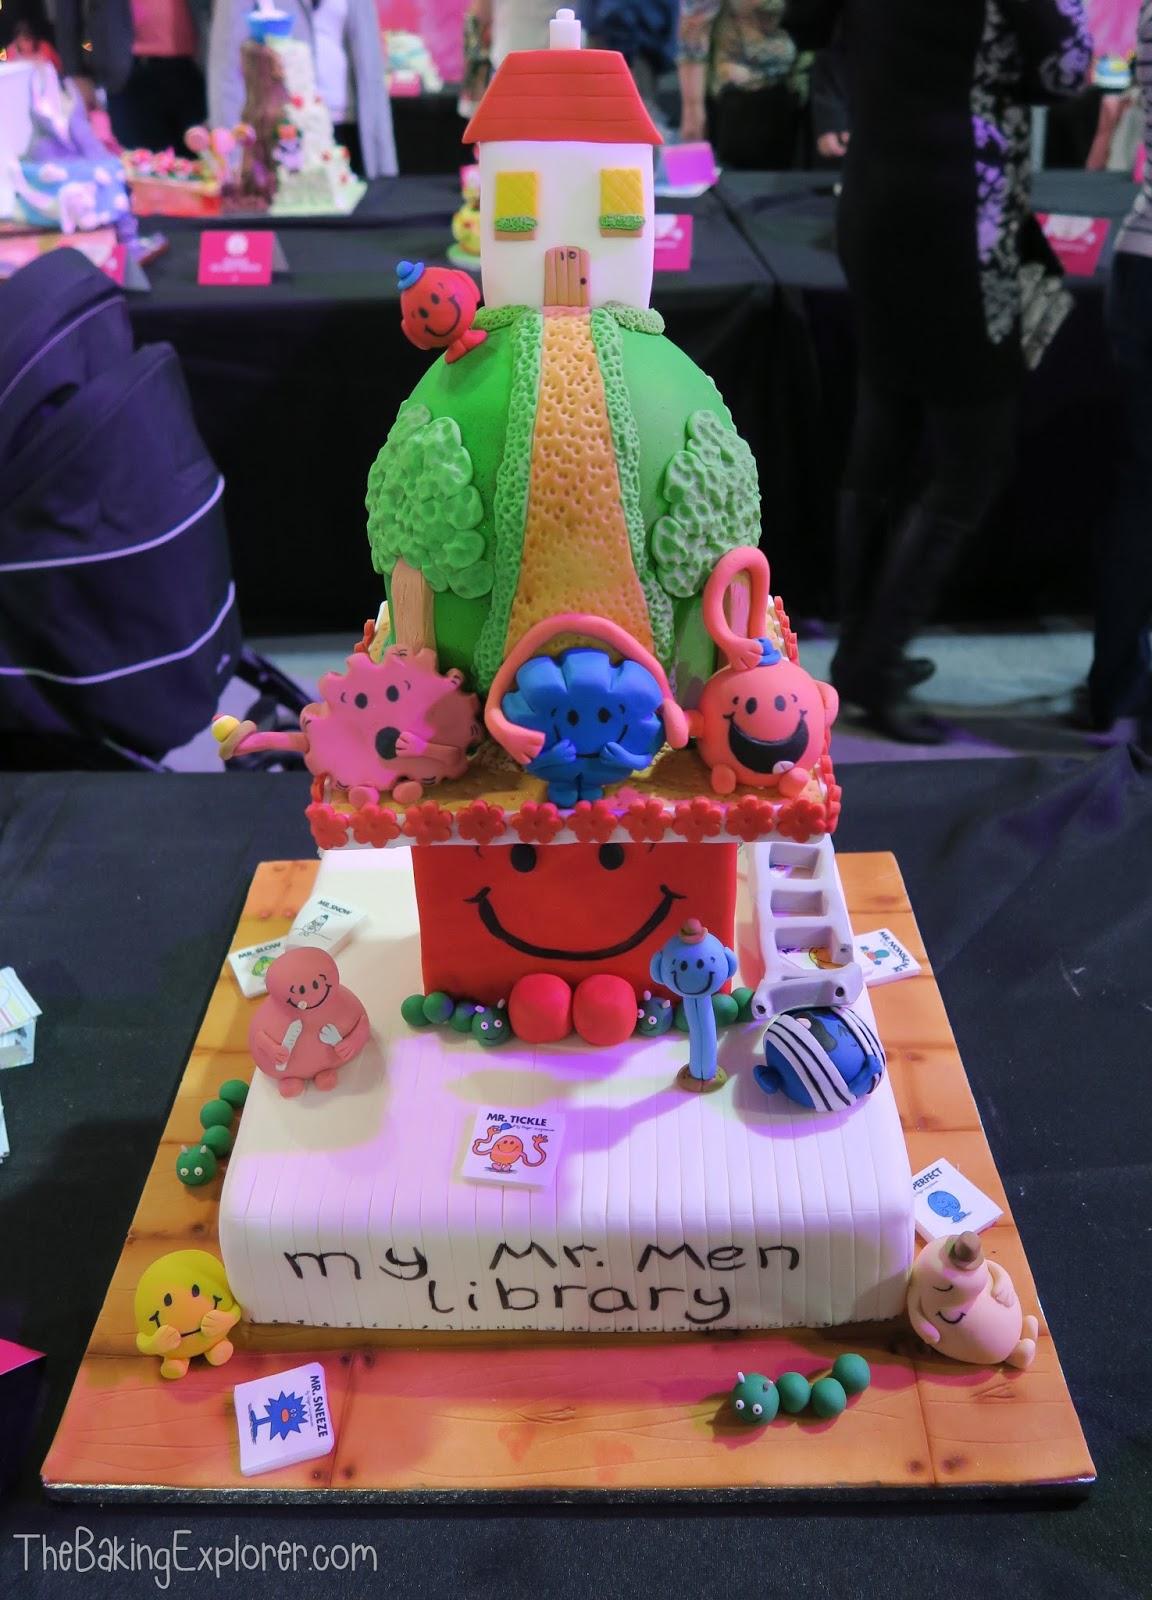 The Cake Bake Show 2015 The Baking Explorer